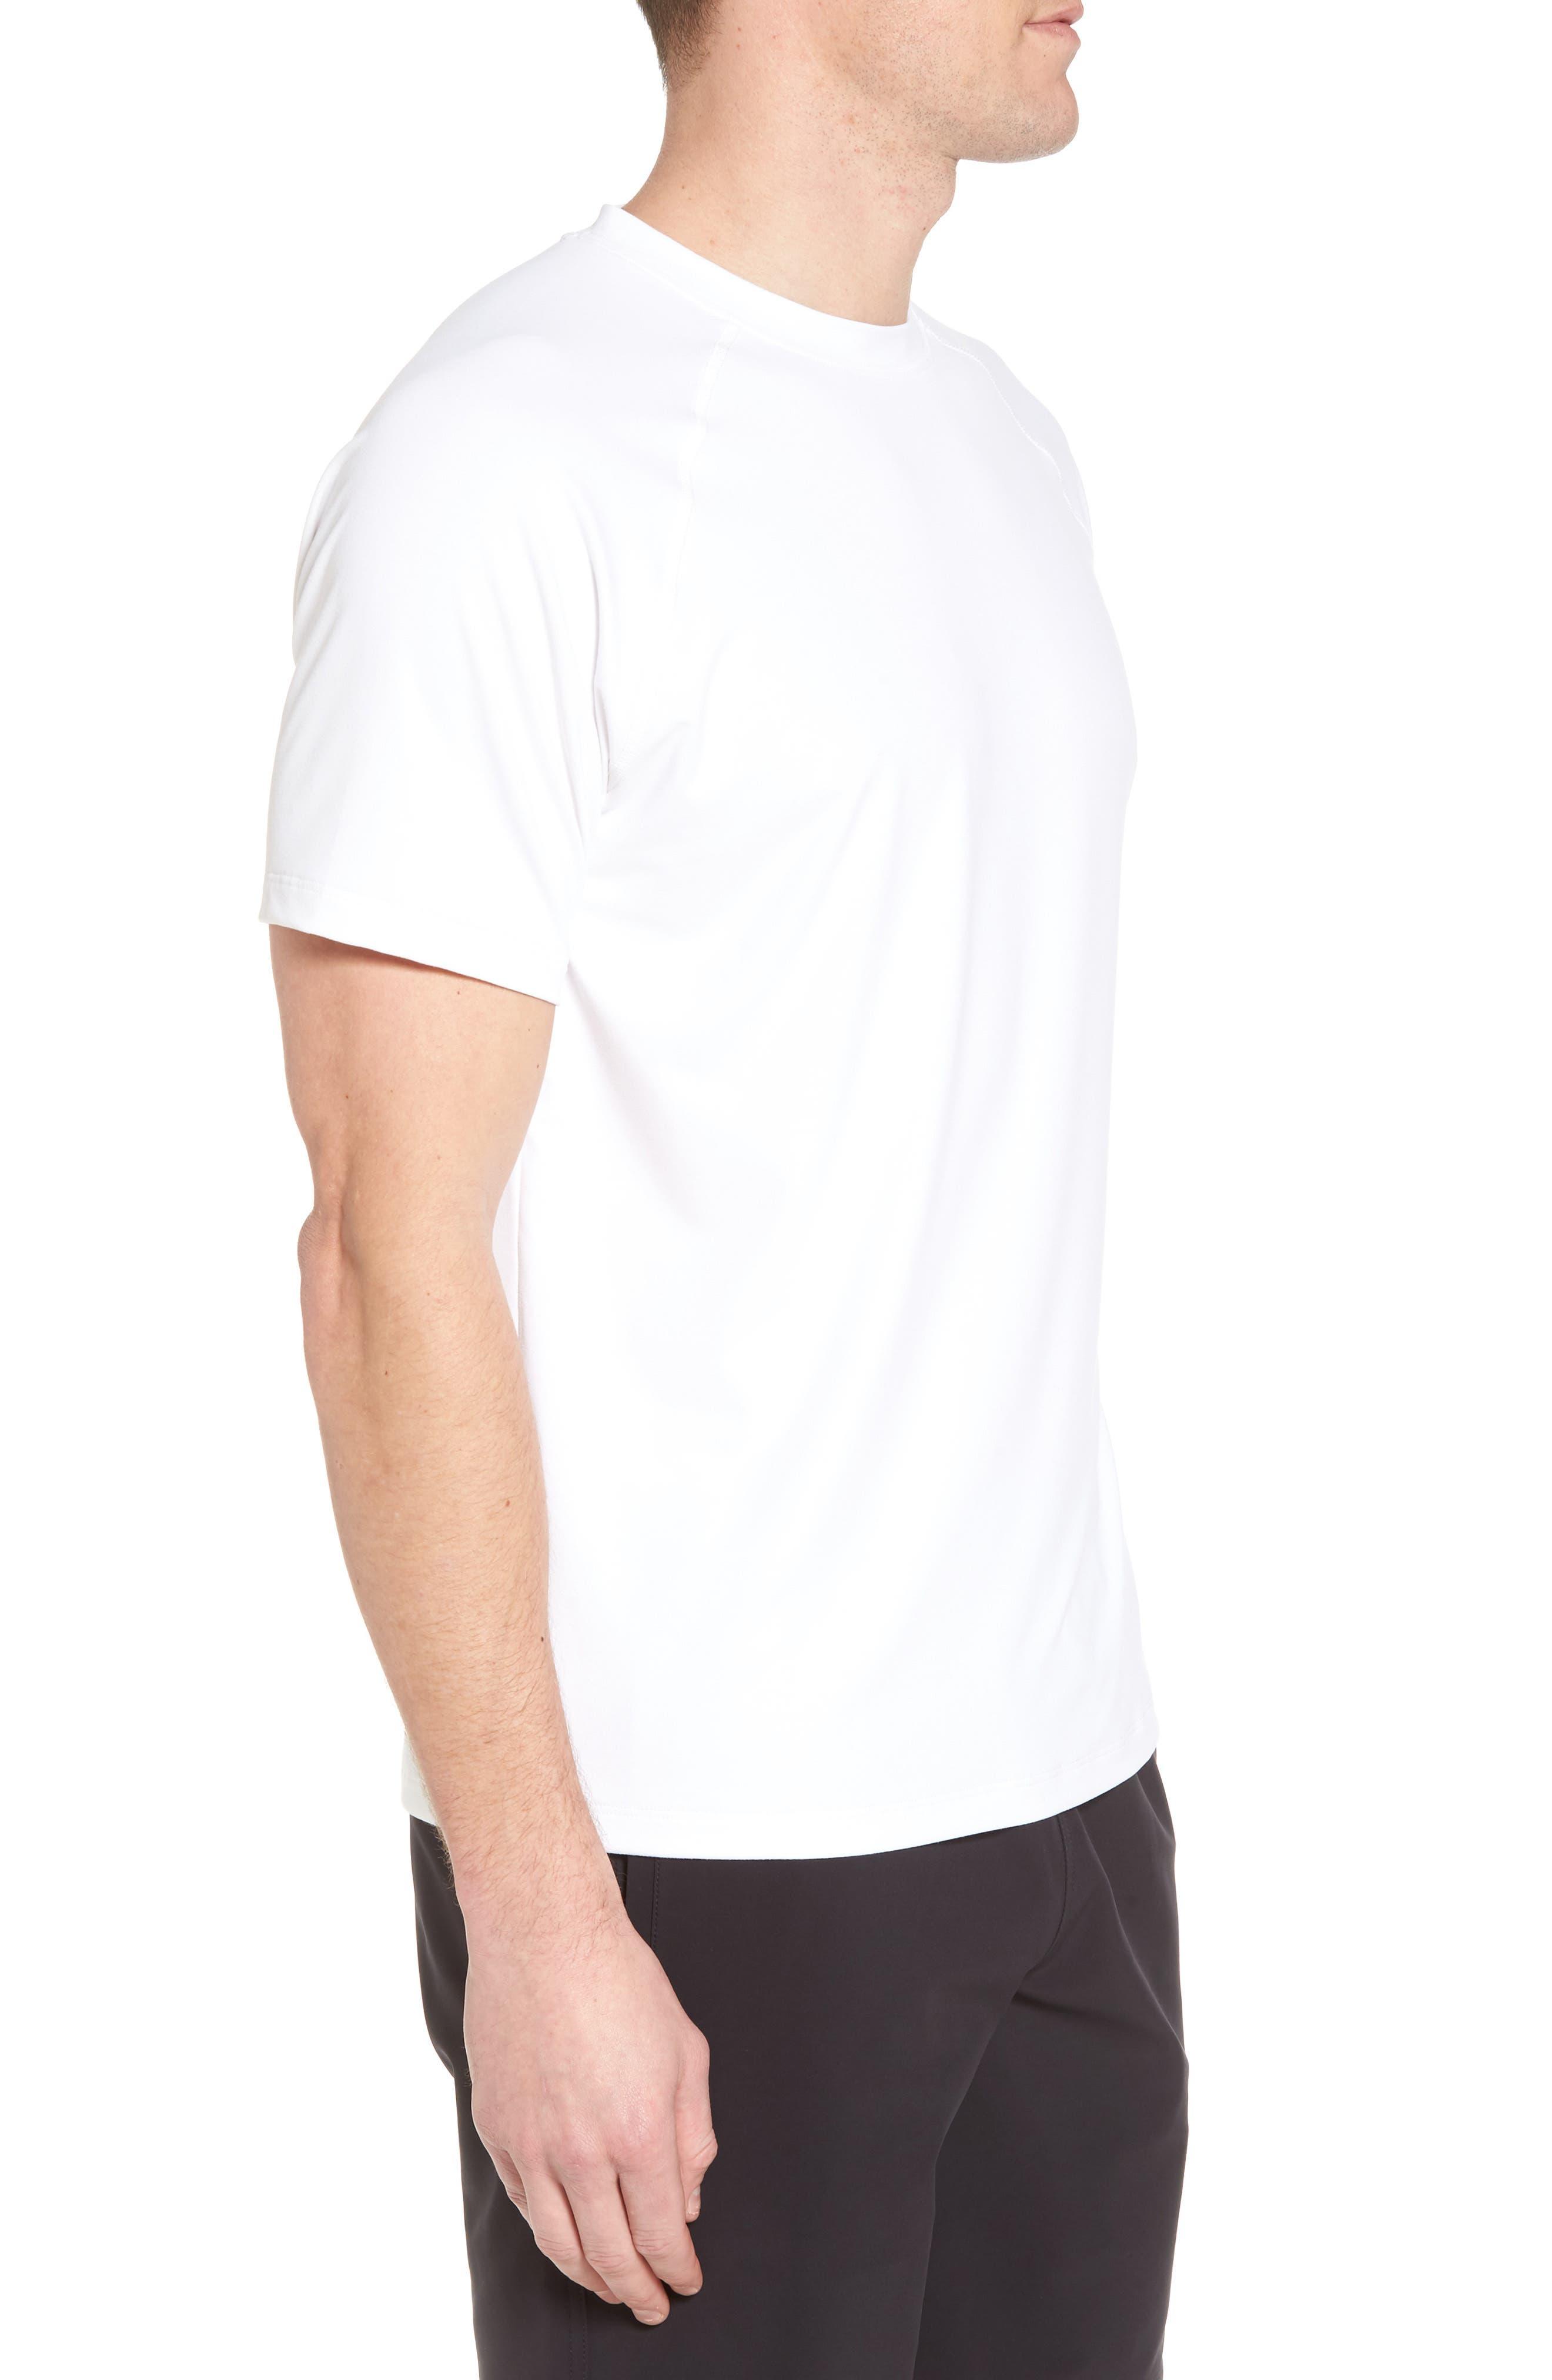 Rio Regular Fit Technical T-Shirt,                             Alternate thumbnail 3, color,                             100